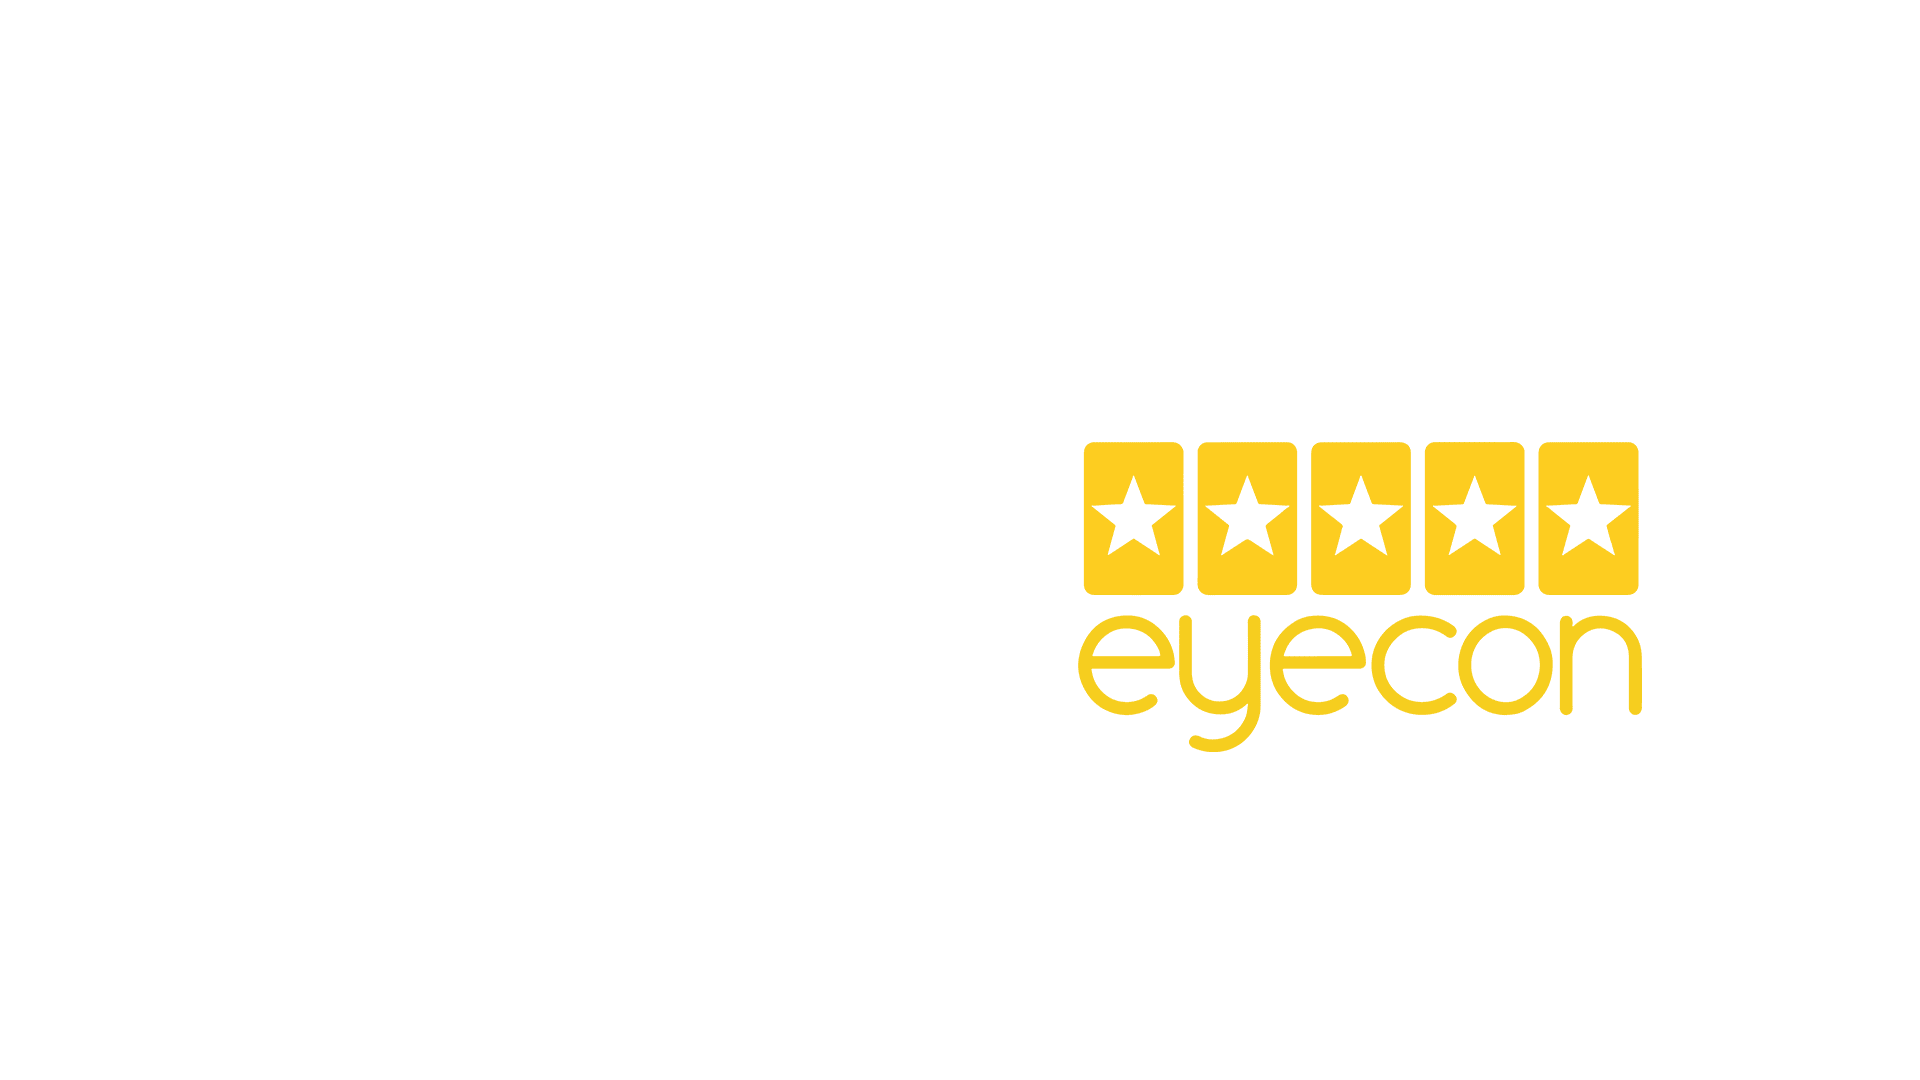 Eyecon slot games online